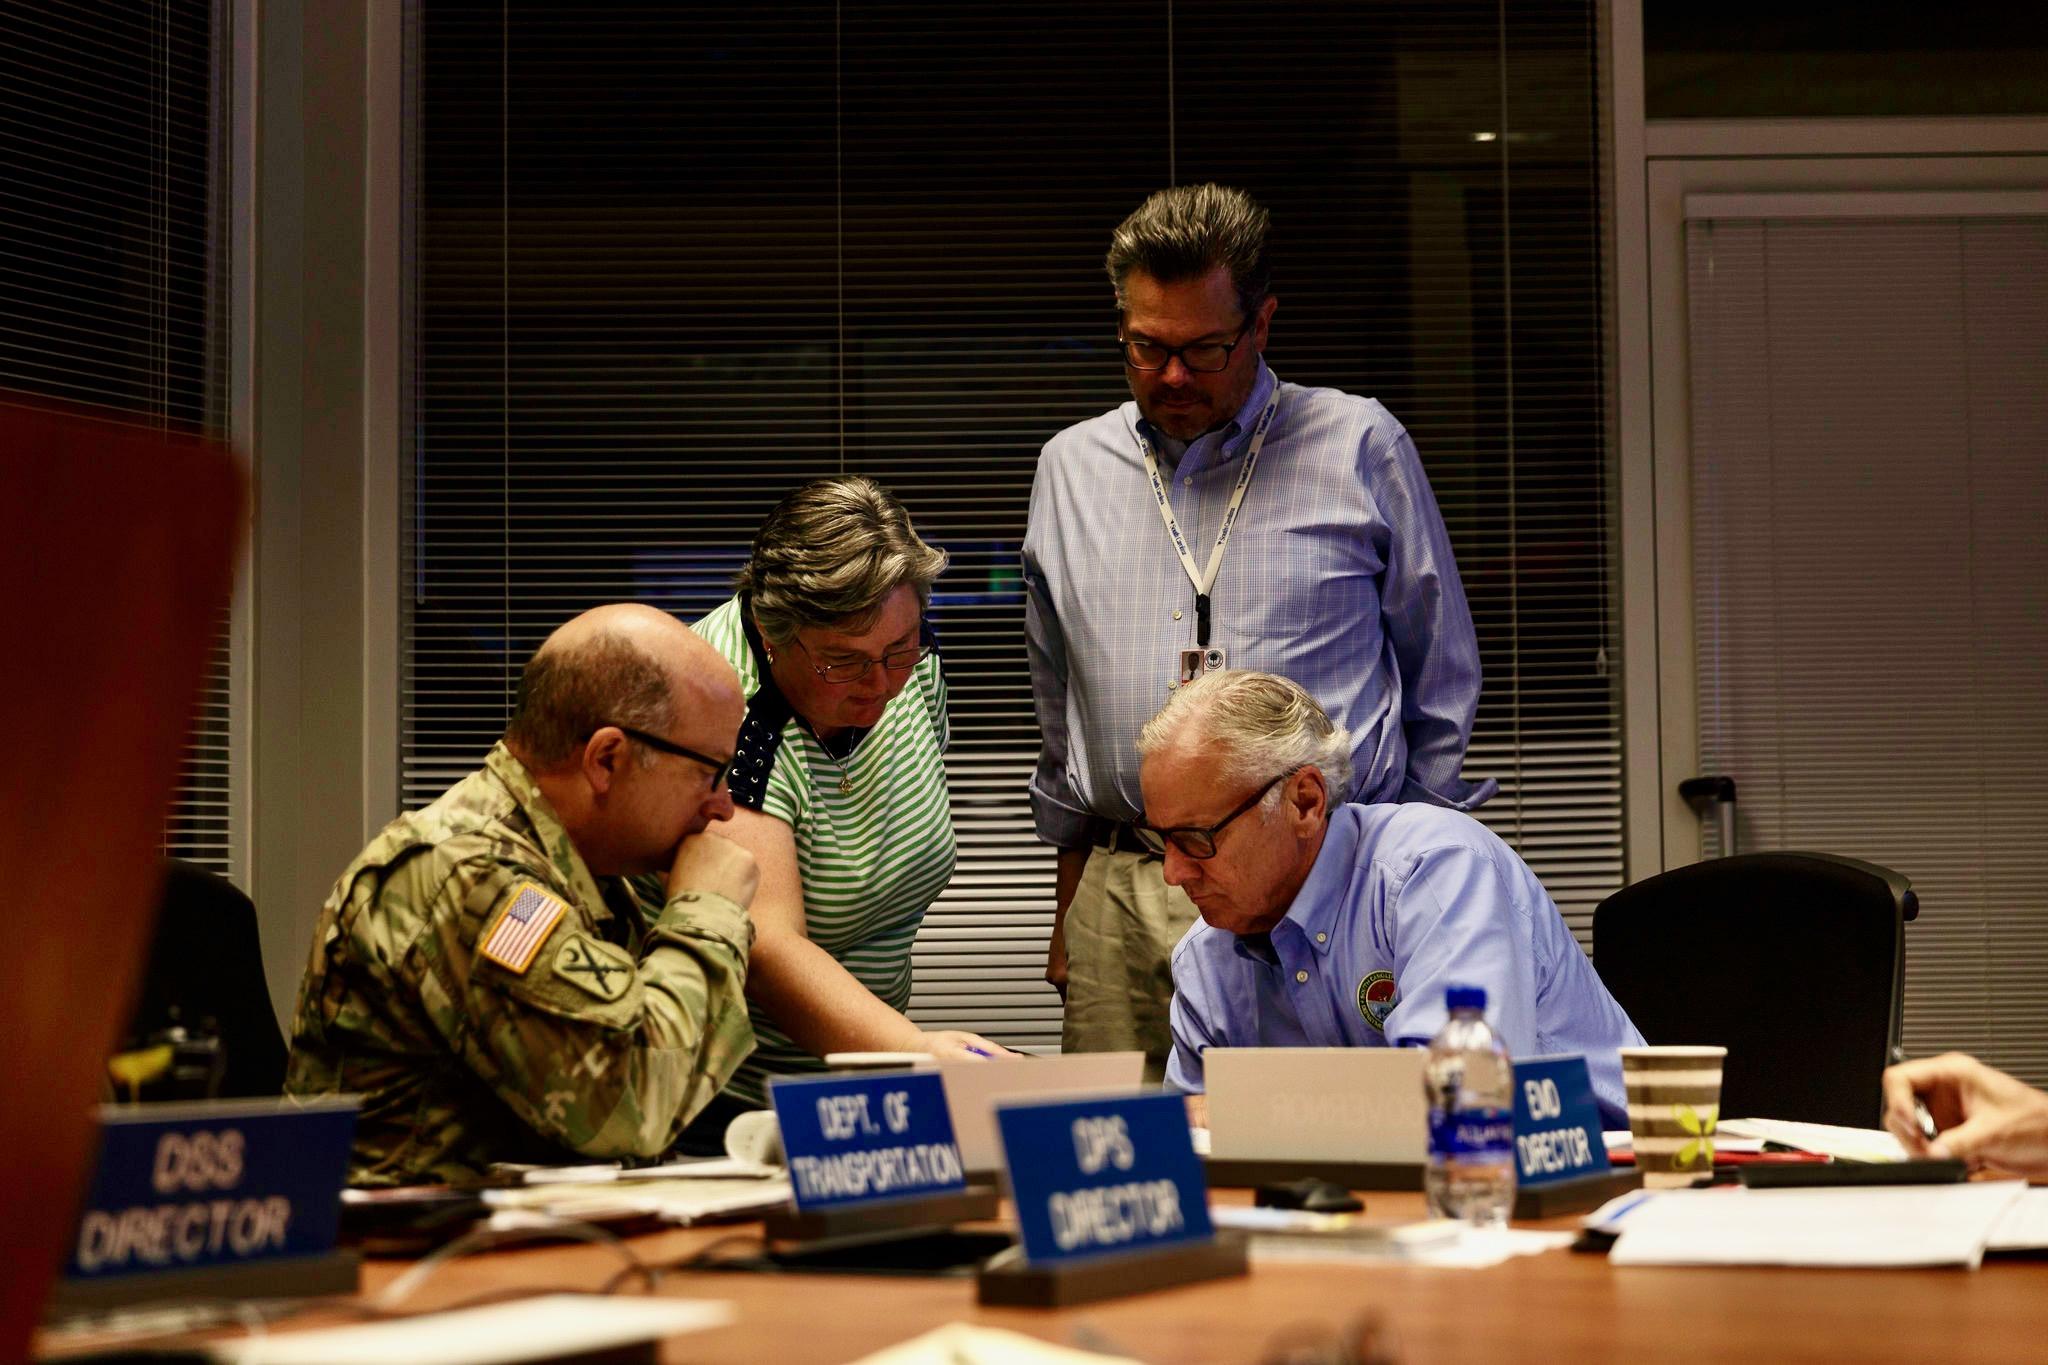 FITSNews – Mainstream Media To Take A Closer Look At South Carolina's 'Shadow Governor'